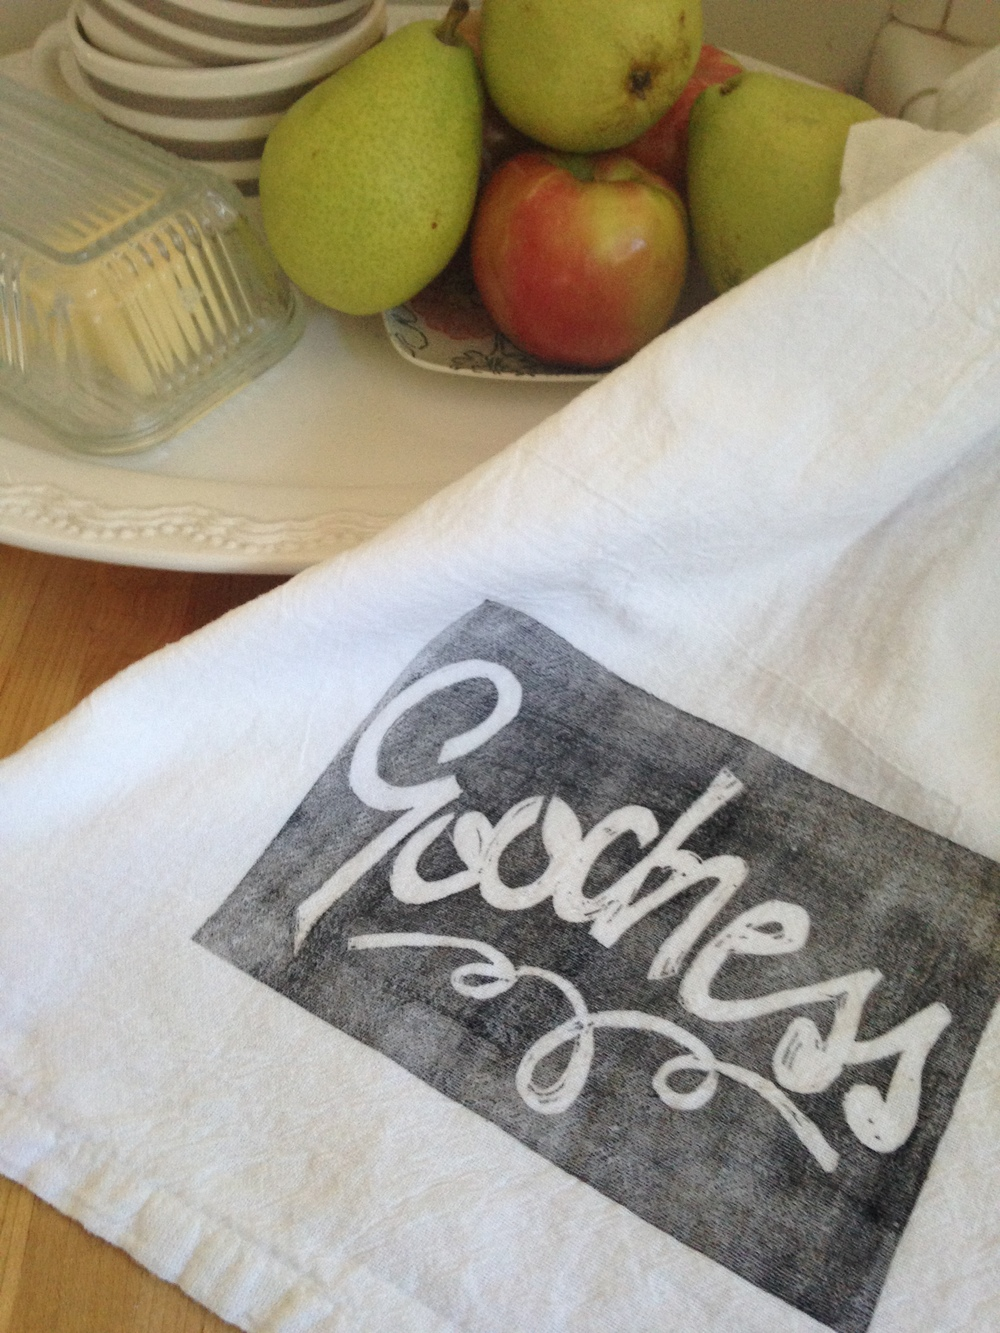 amie-longmire-goodness-tea-towel